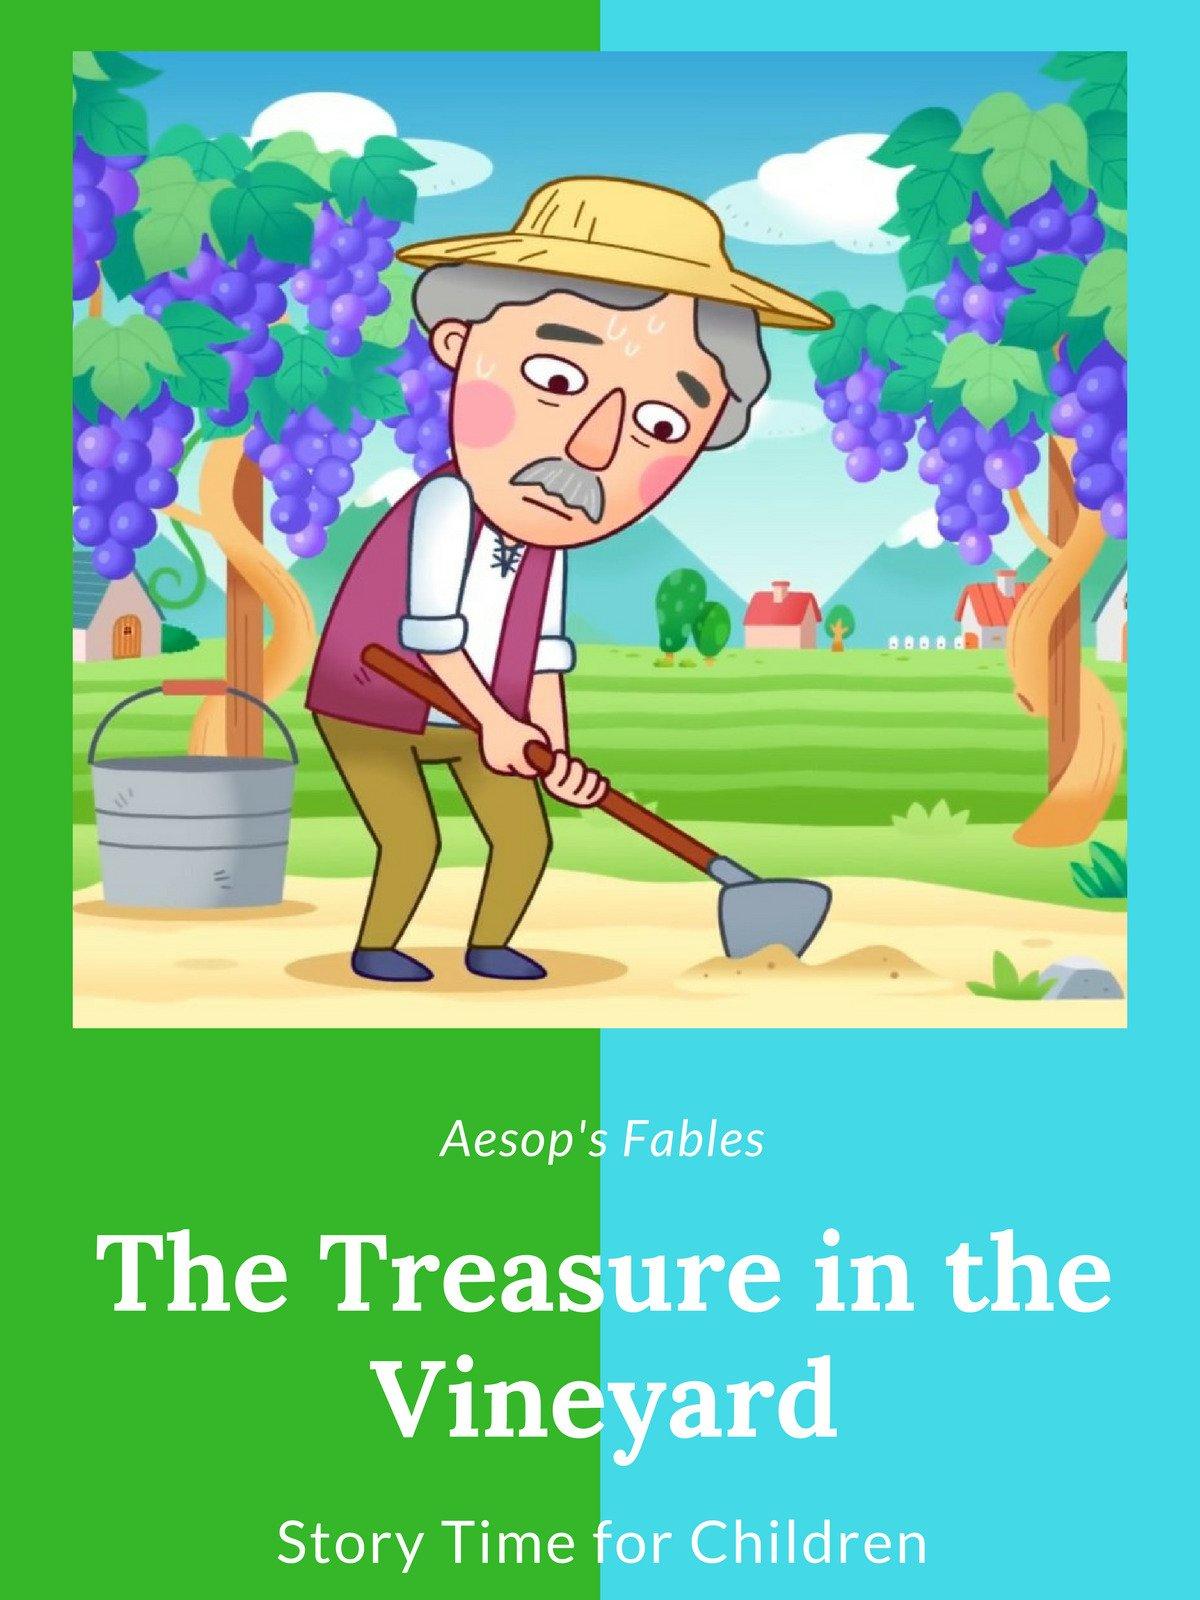 The Treasure in the Vineyard